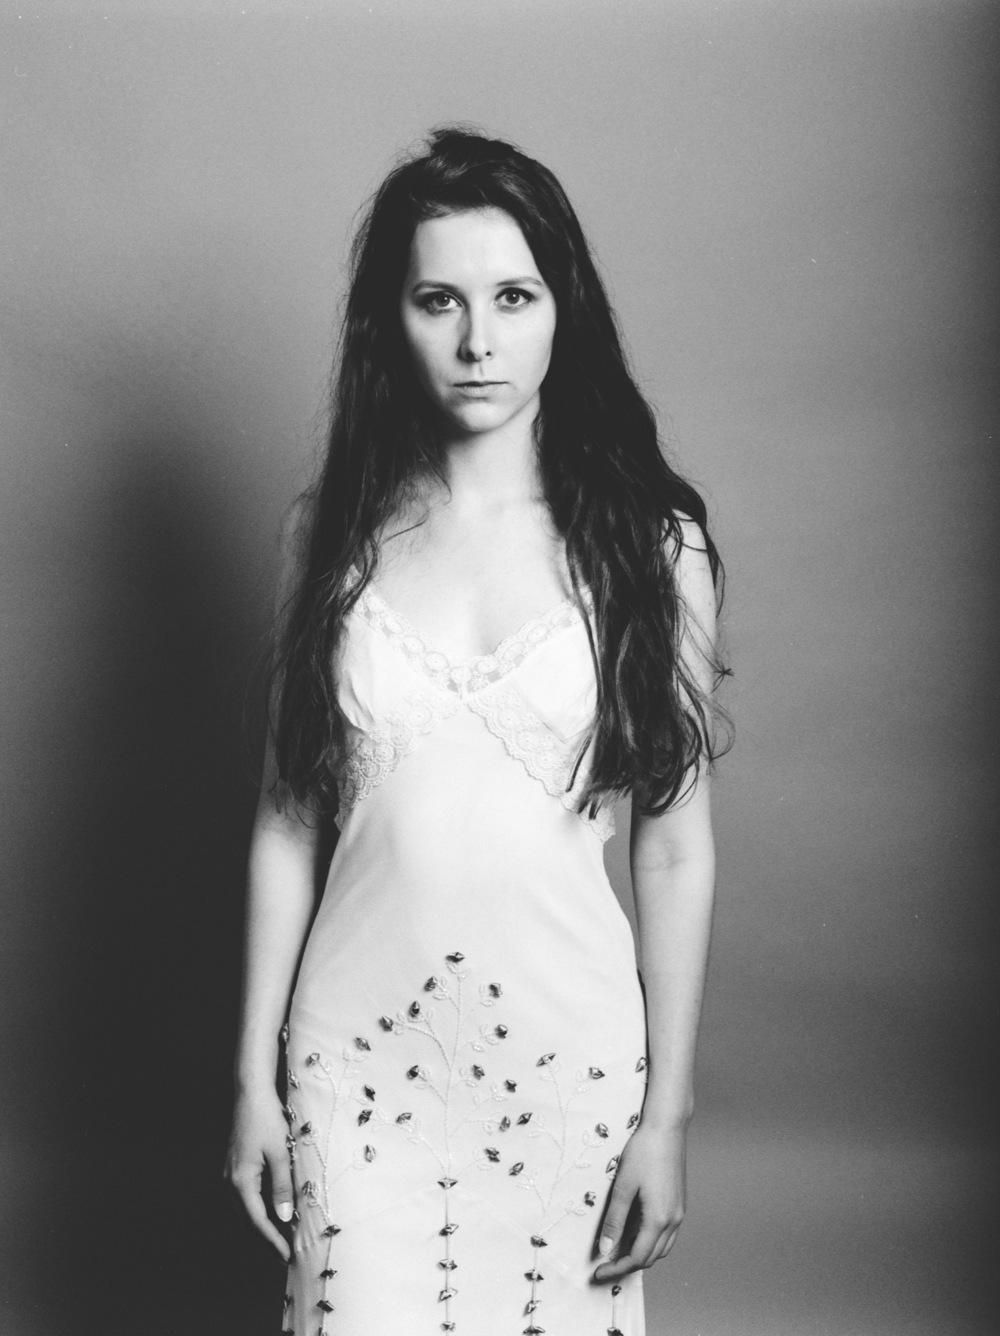 Model: Alexandra Petkus  Camera: Mamiya 645AFD  Film: HP5+